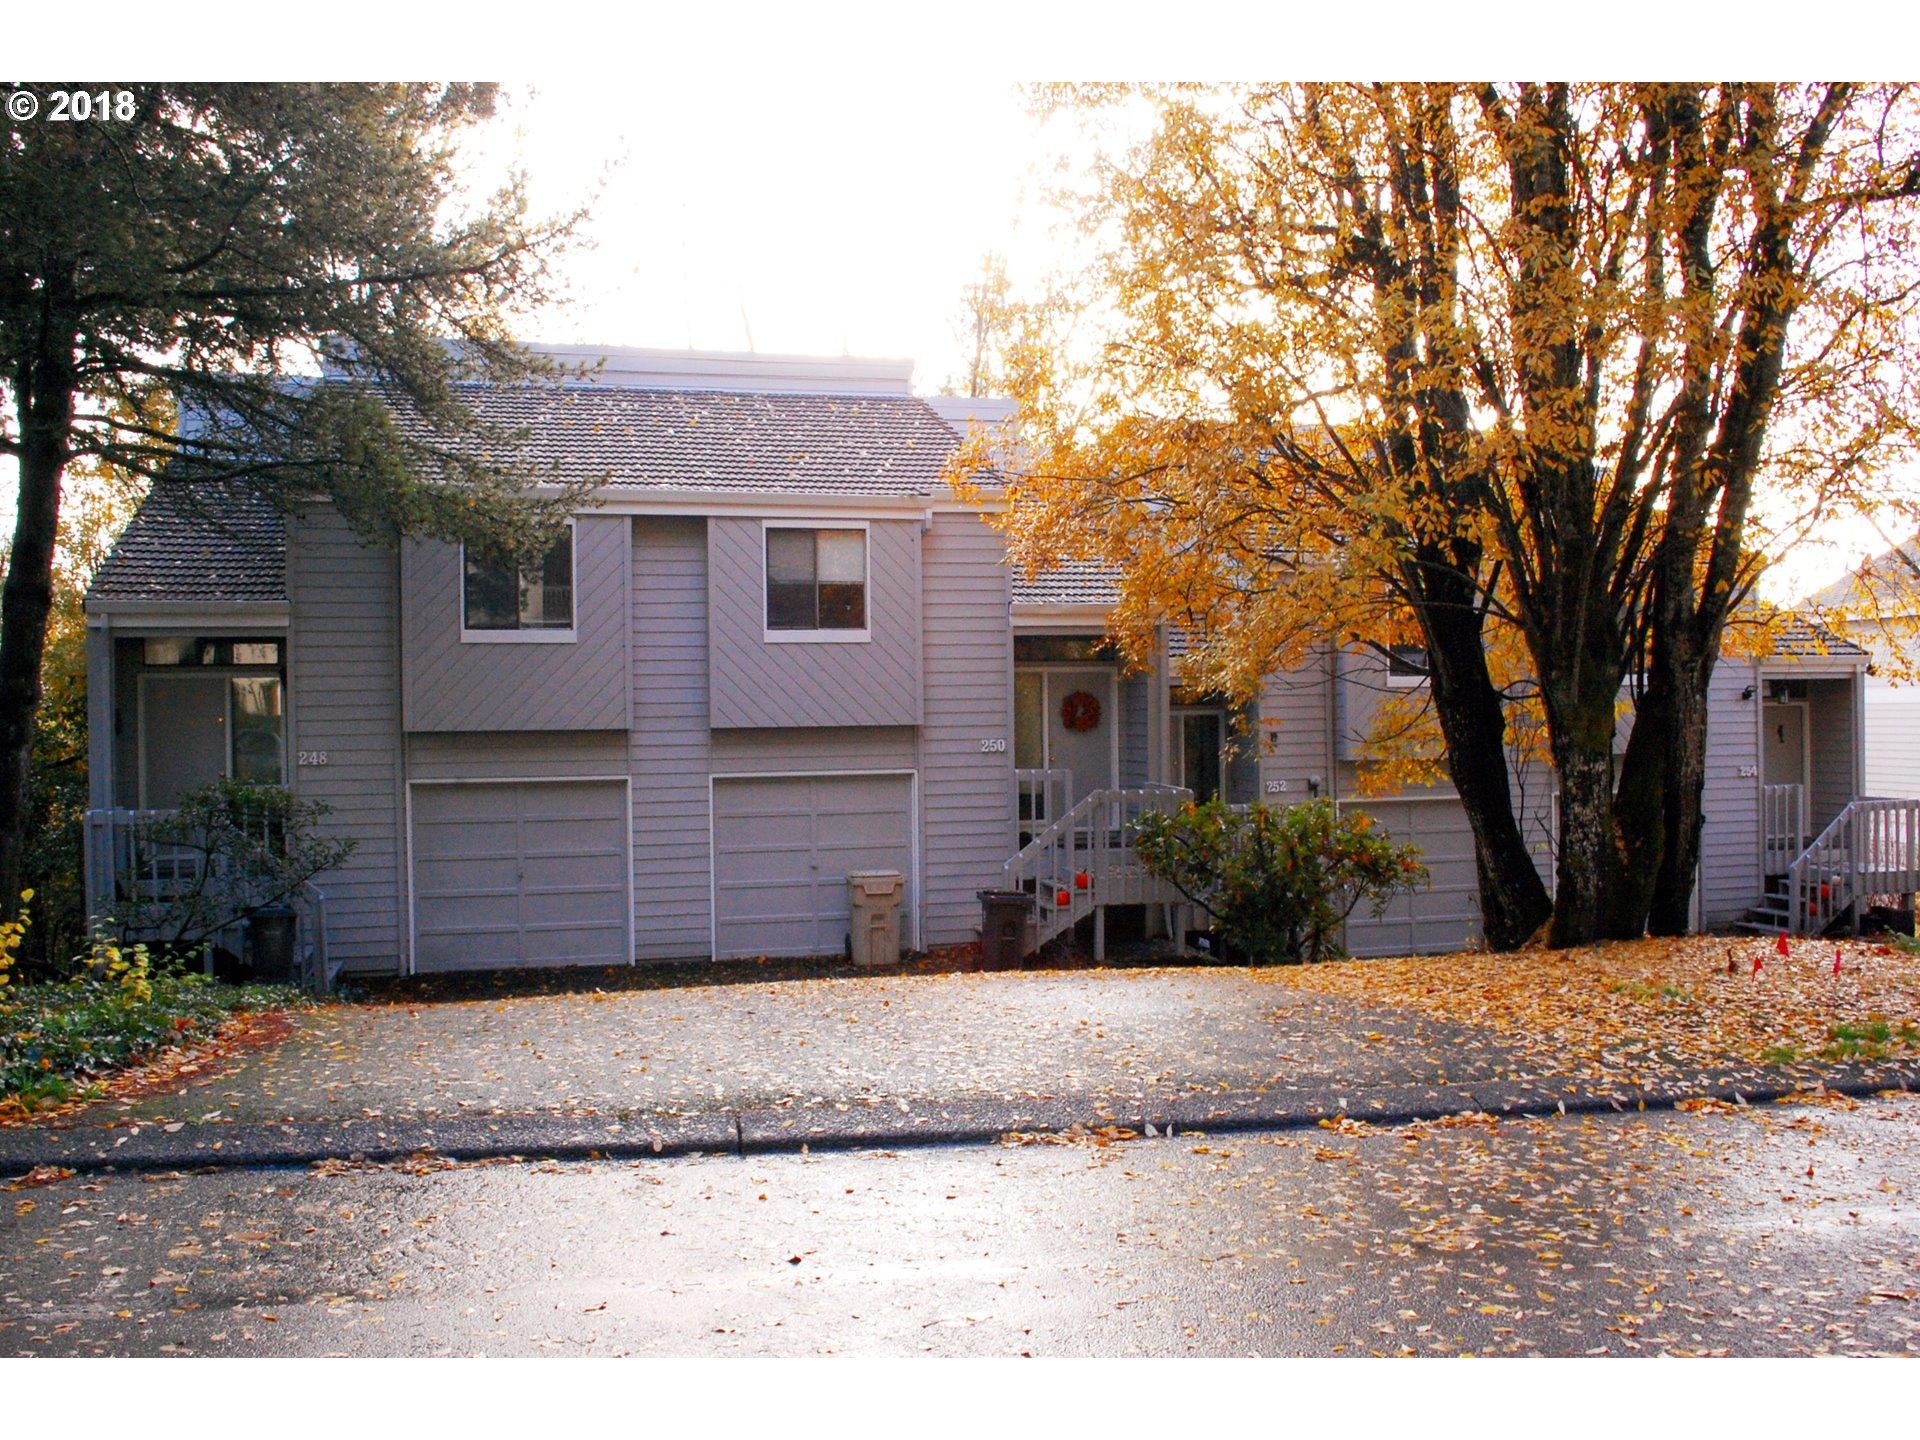 248 CERVANTES Lake Oswego, OR 97035 - MLS #: 18146636